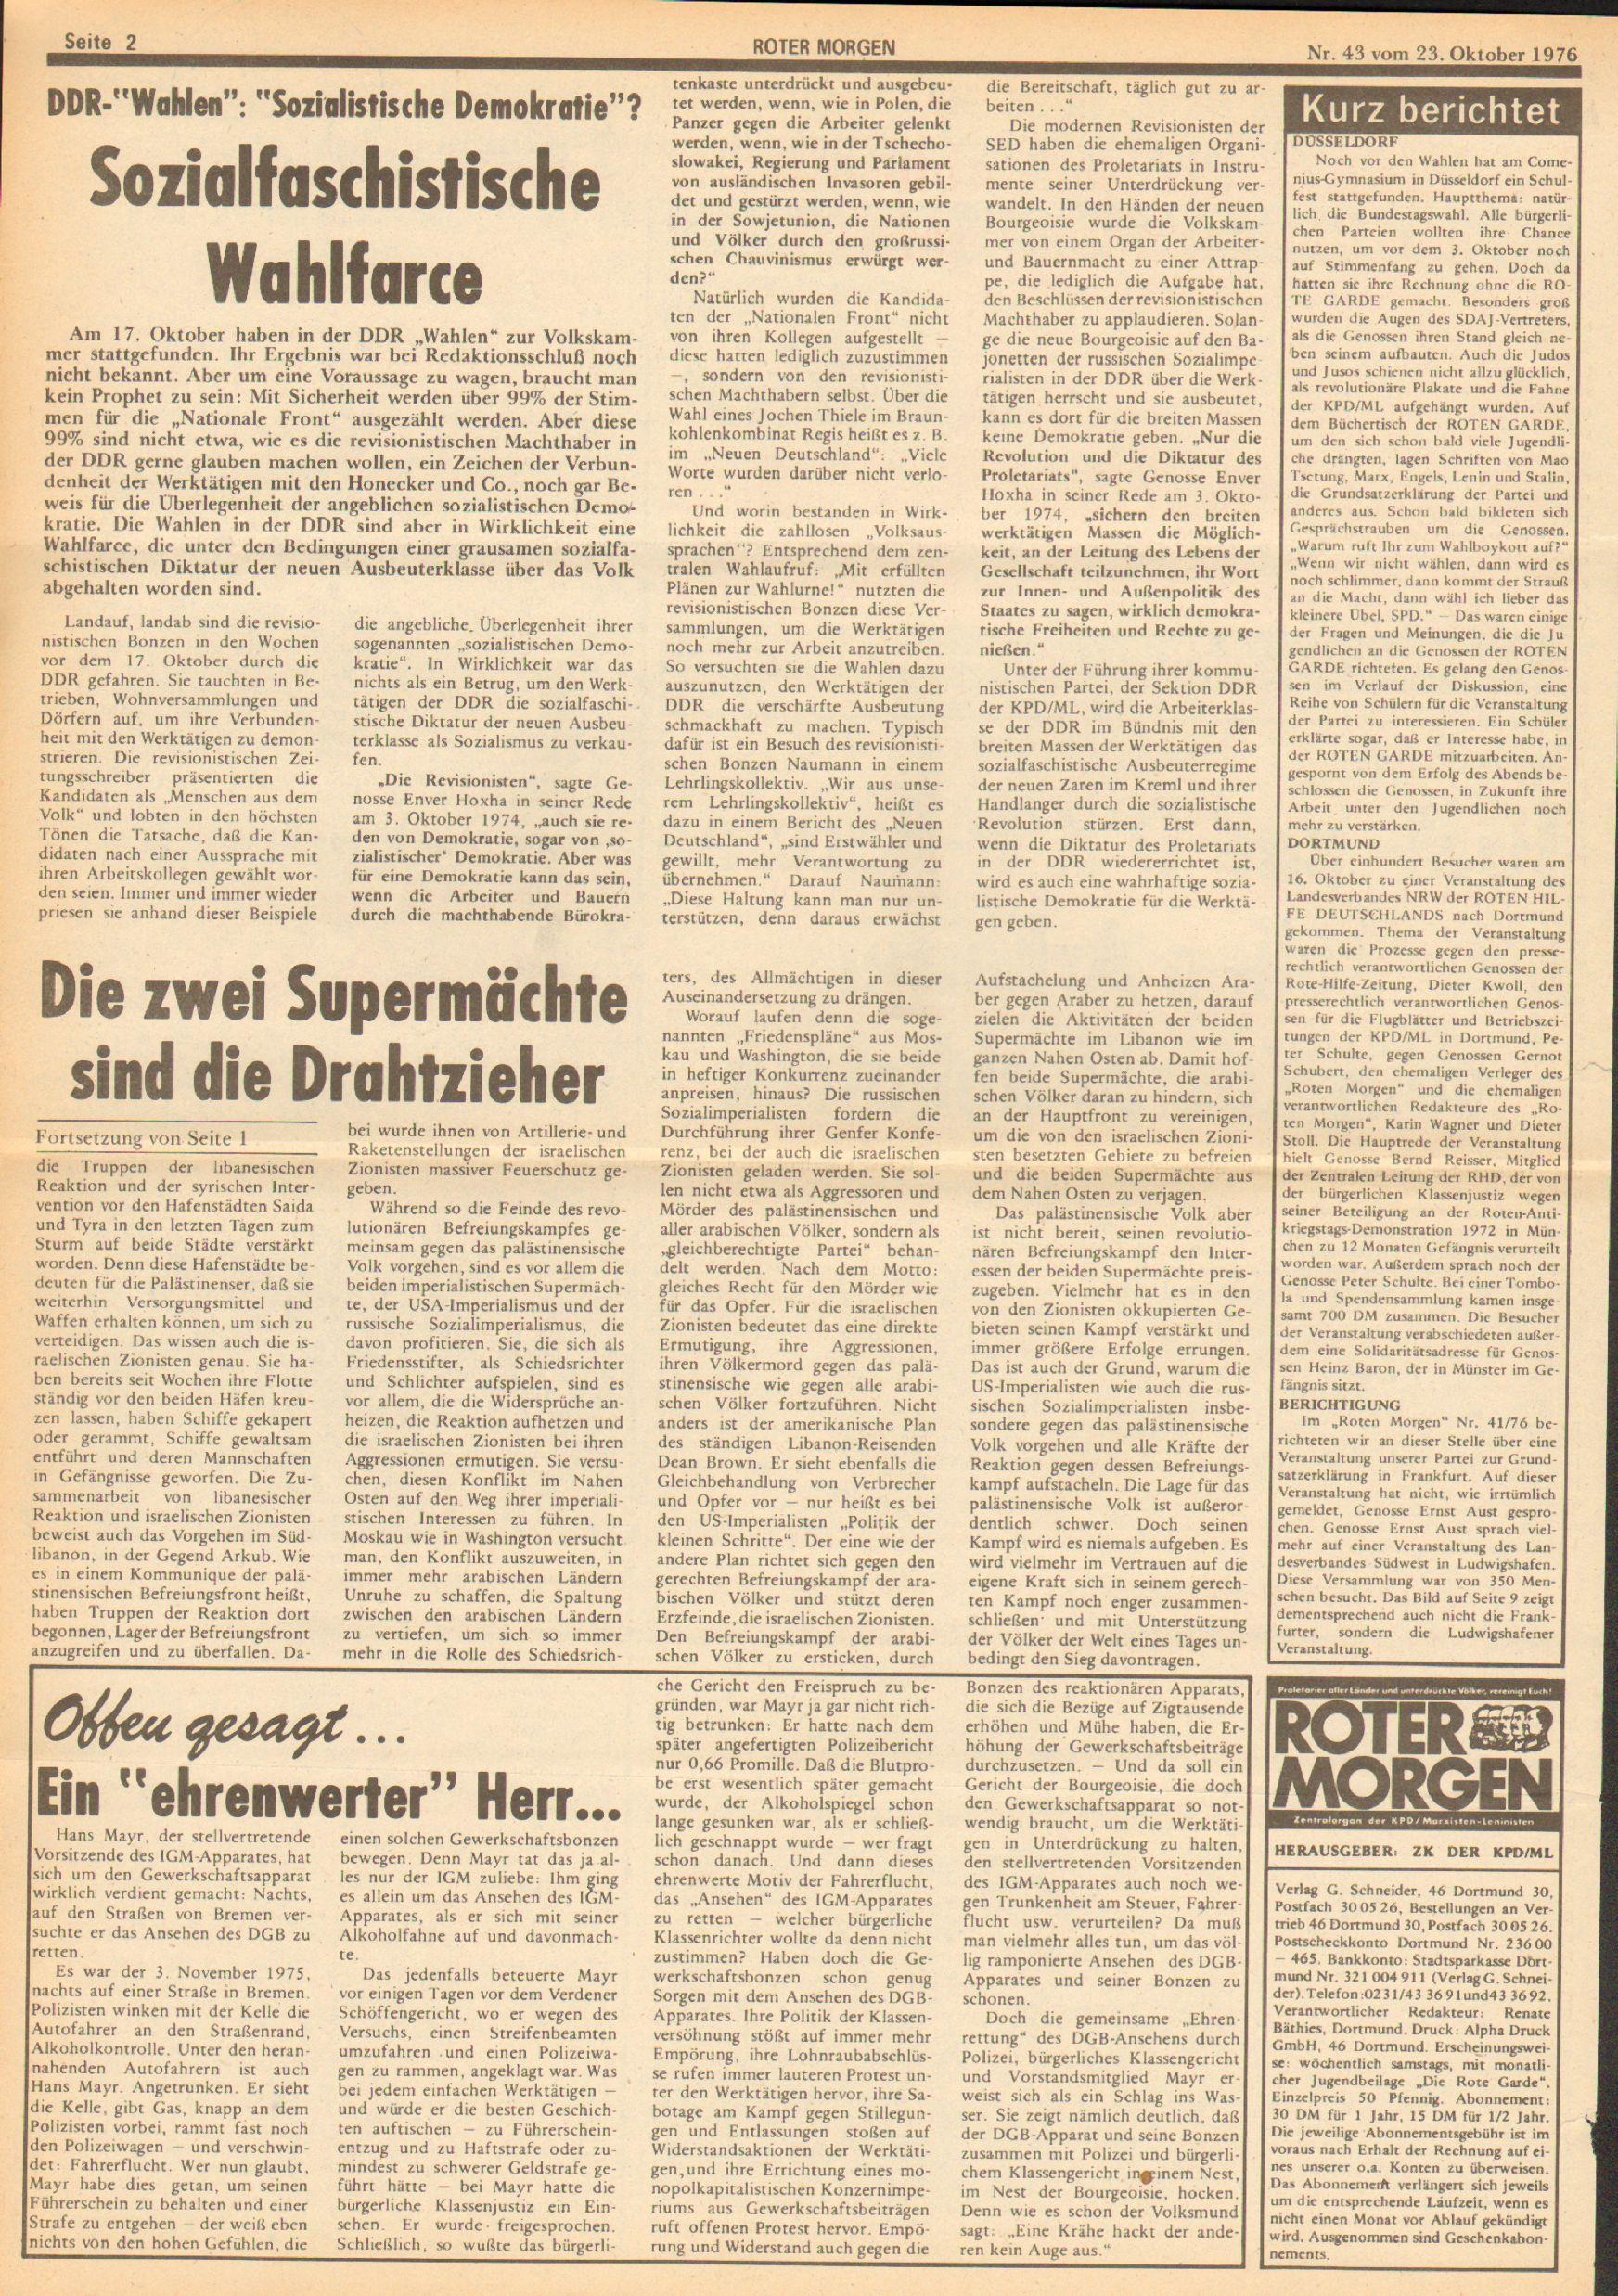 Roter Morgen, 10. Jg., 23. Oktober 1976, Nr. 43, Seite 2